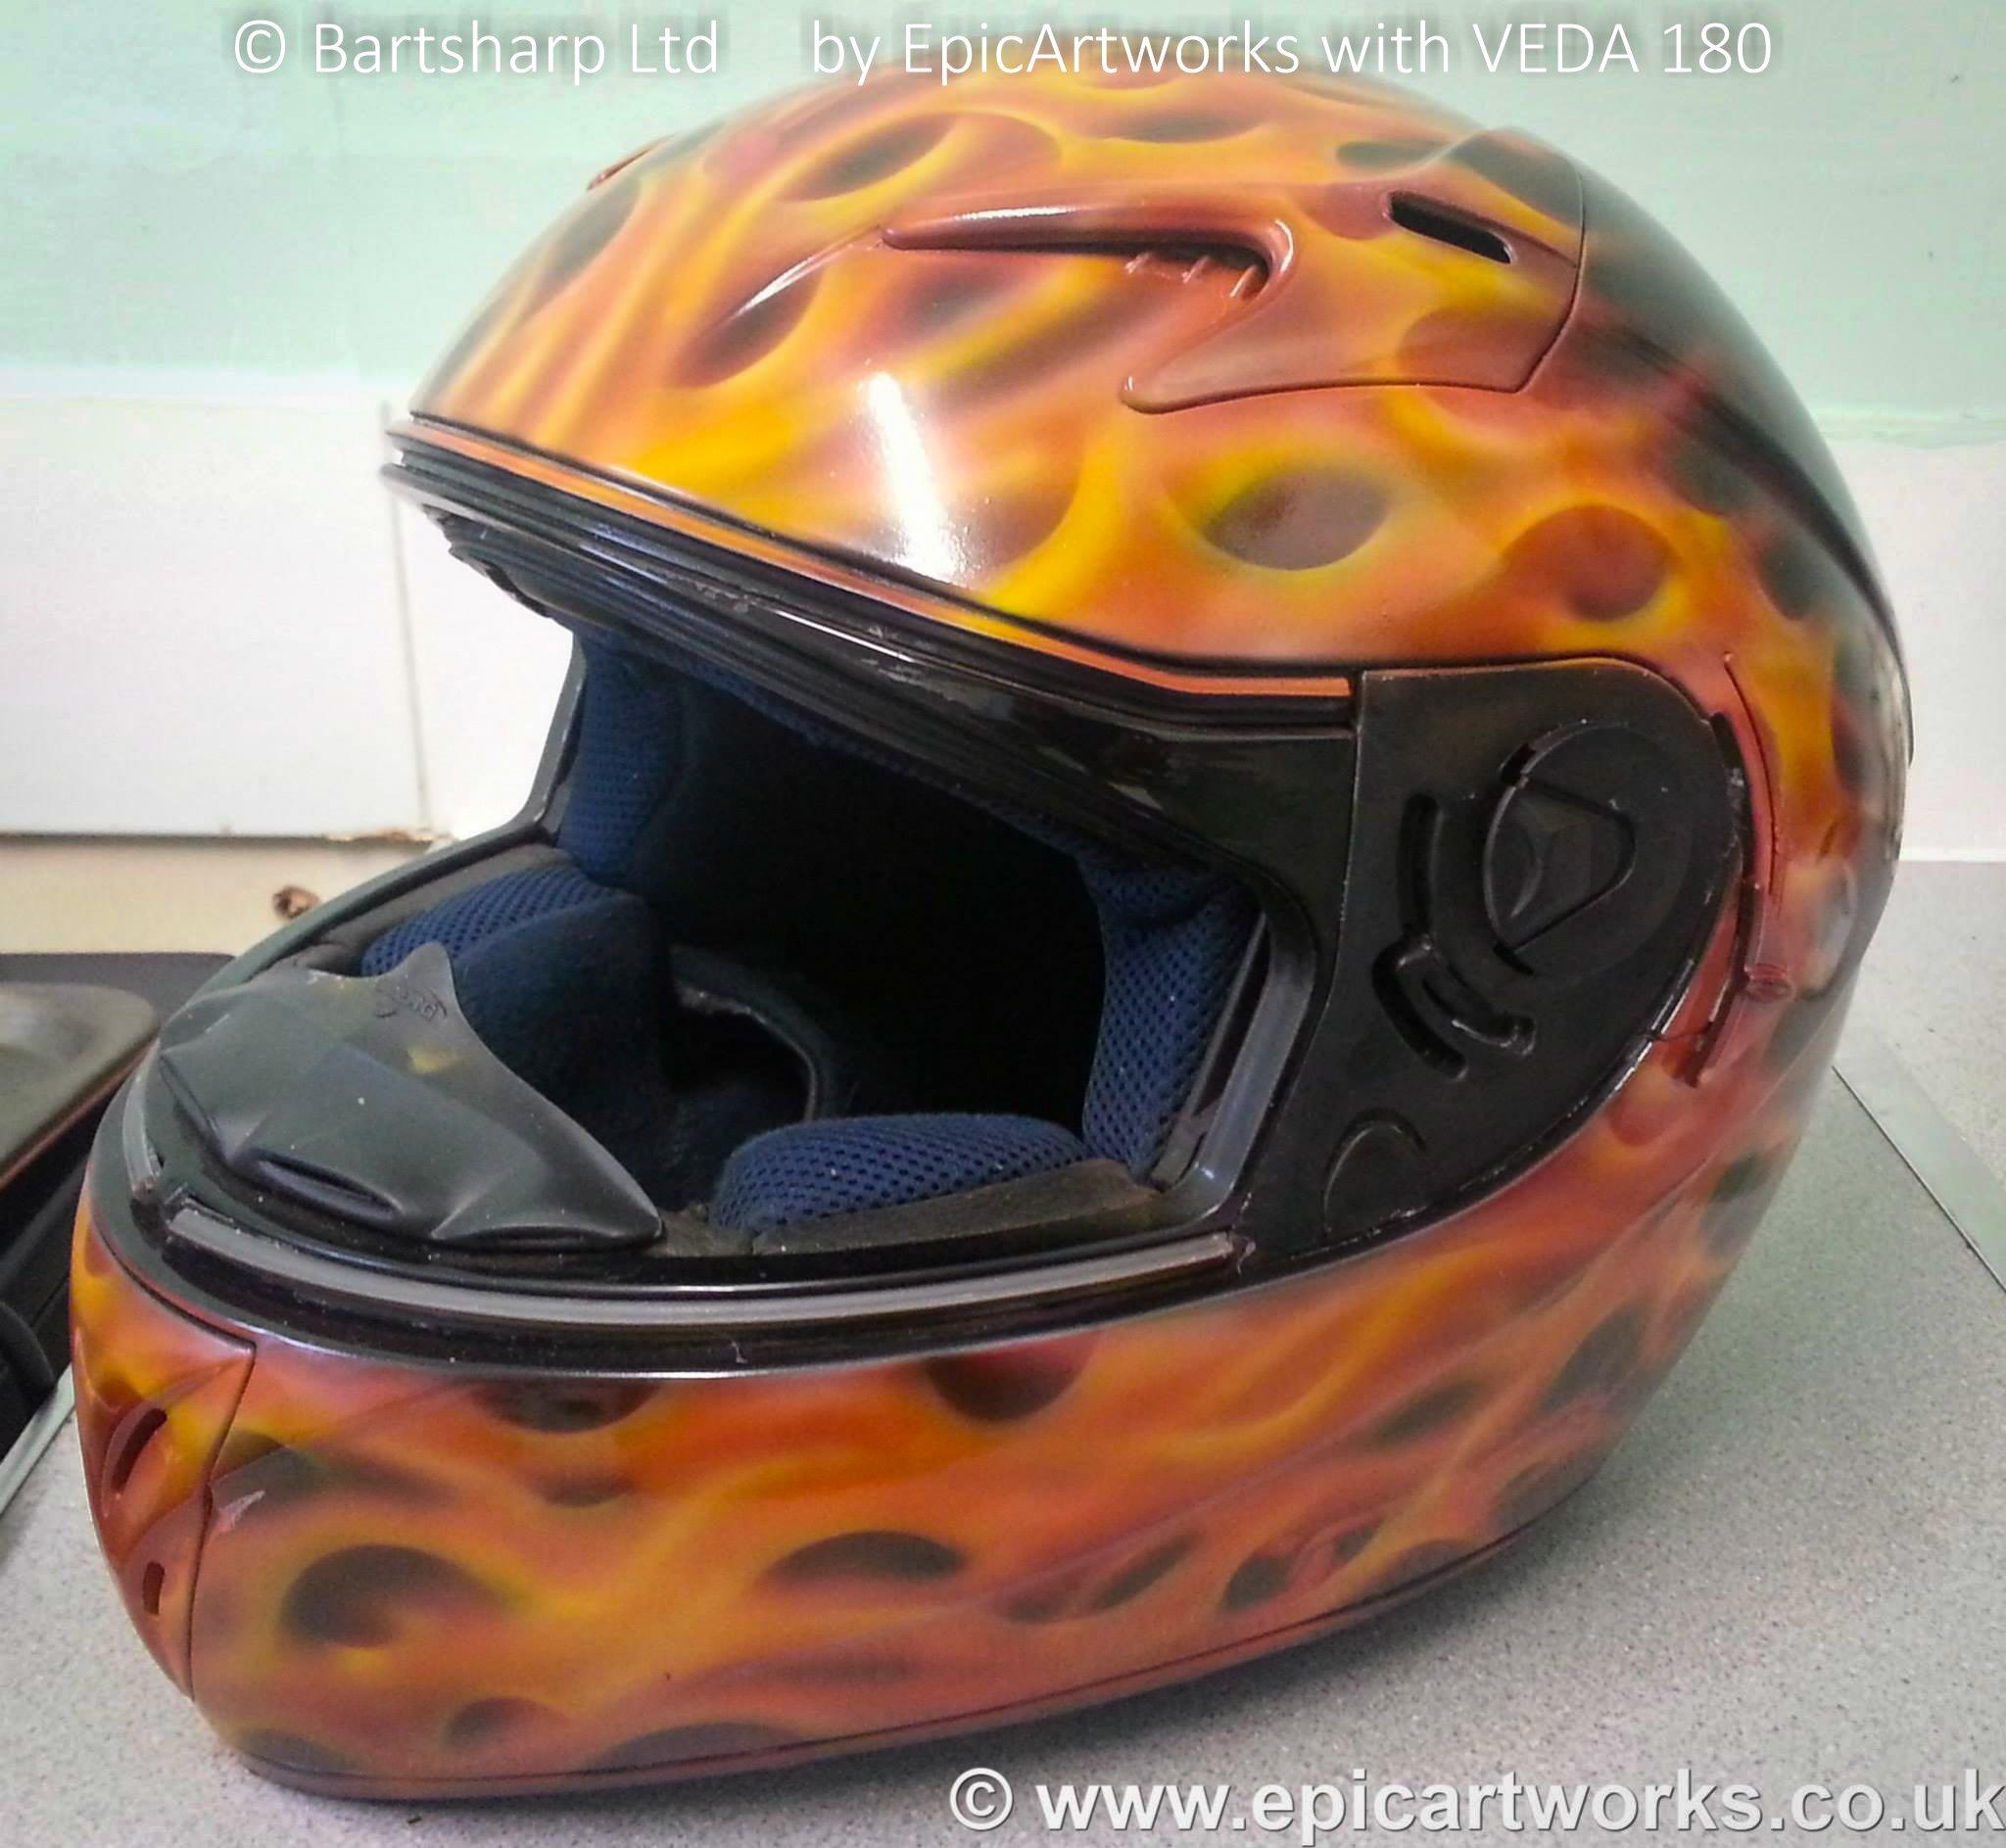 EpicArtworks Custom Painting Helmet5 Using Bartsharp 180 Airbrush